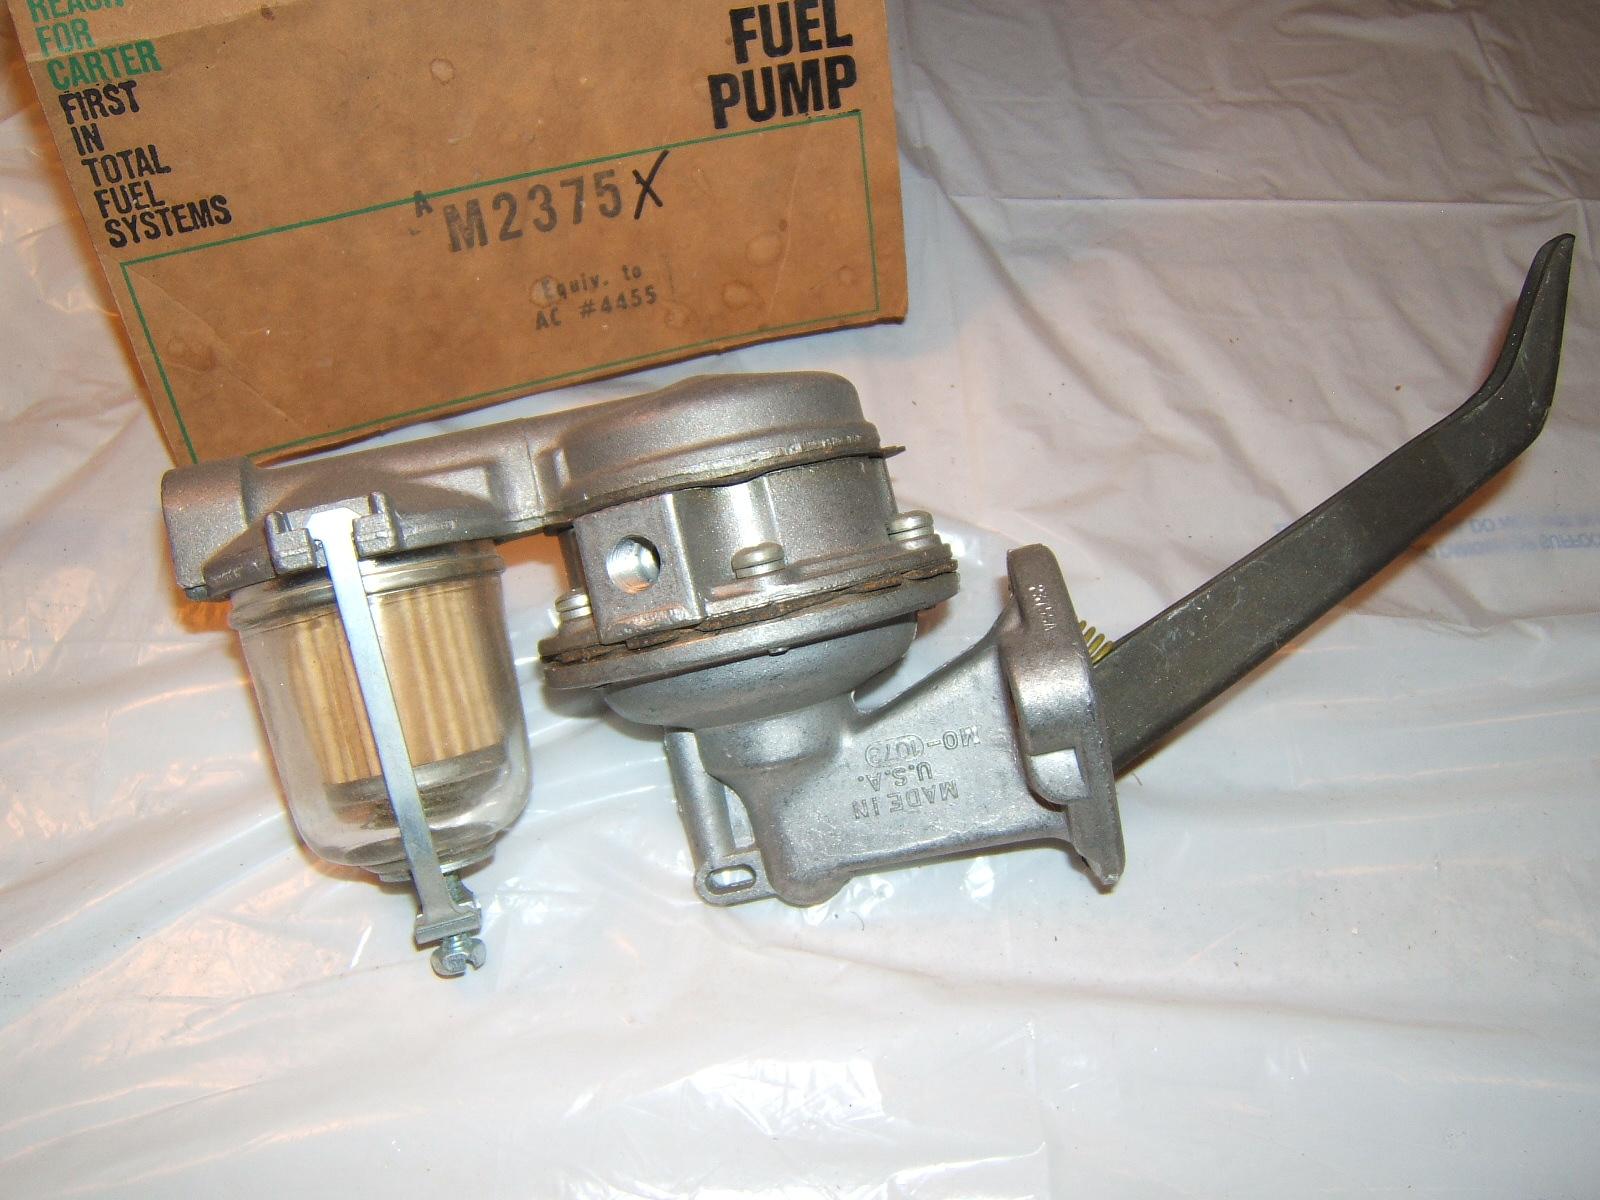 1955 -75 International 401 478 549 v8 new fuel pump (A 2375x)